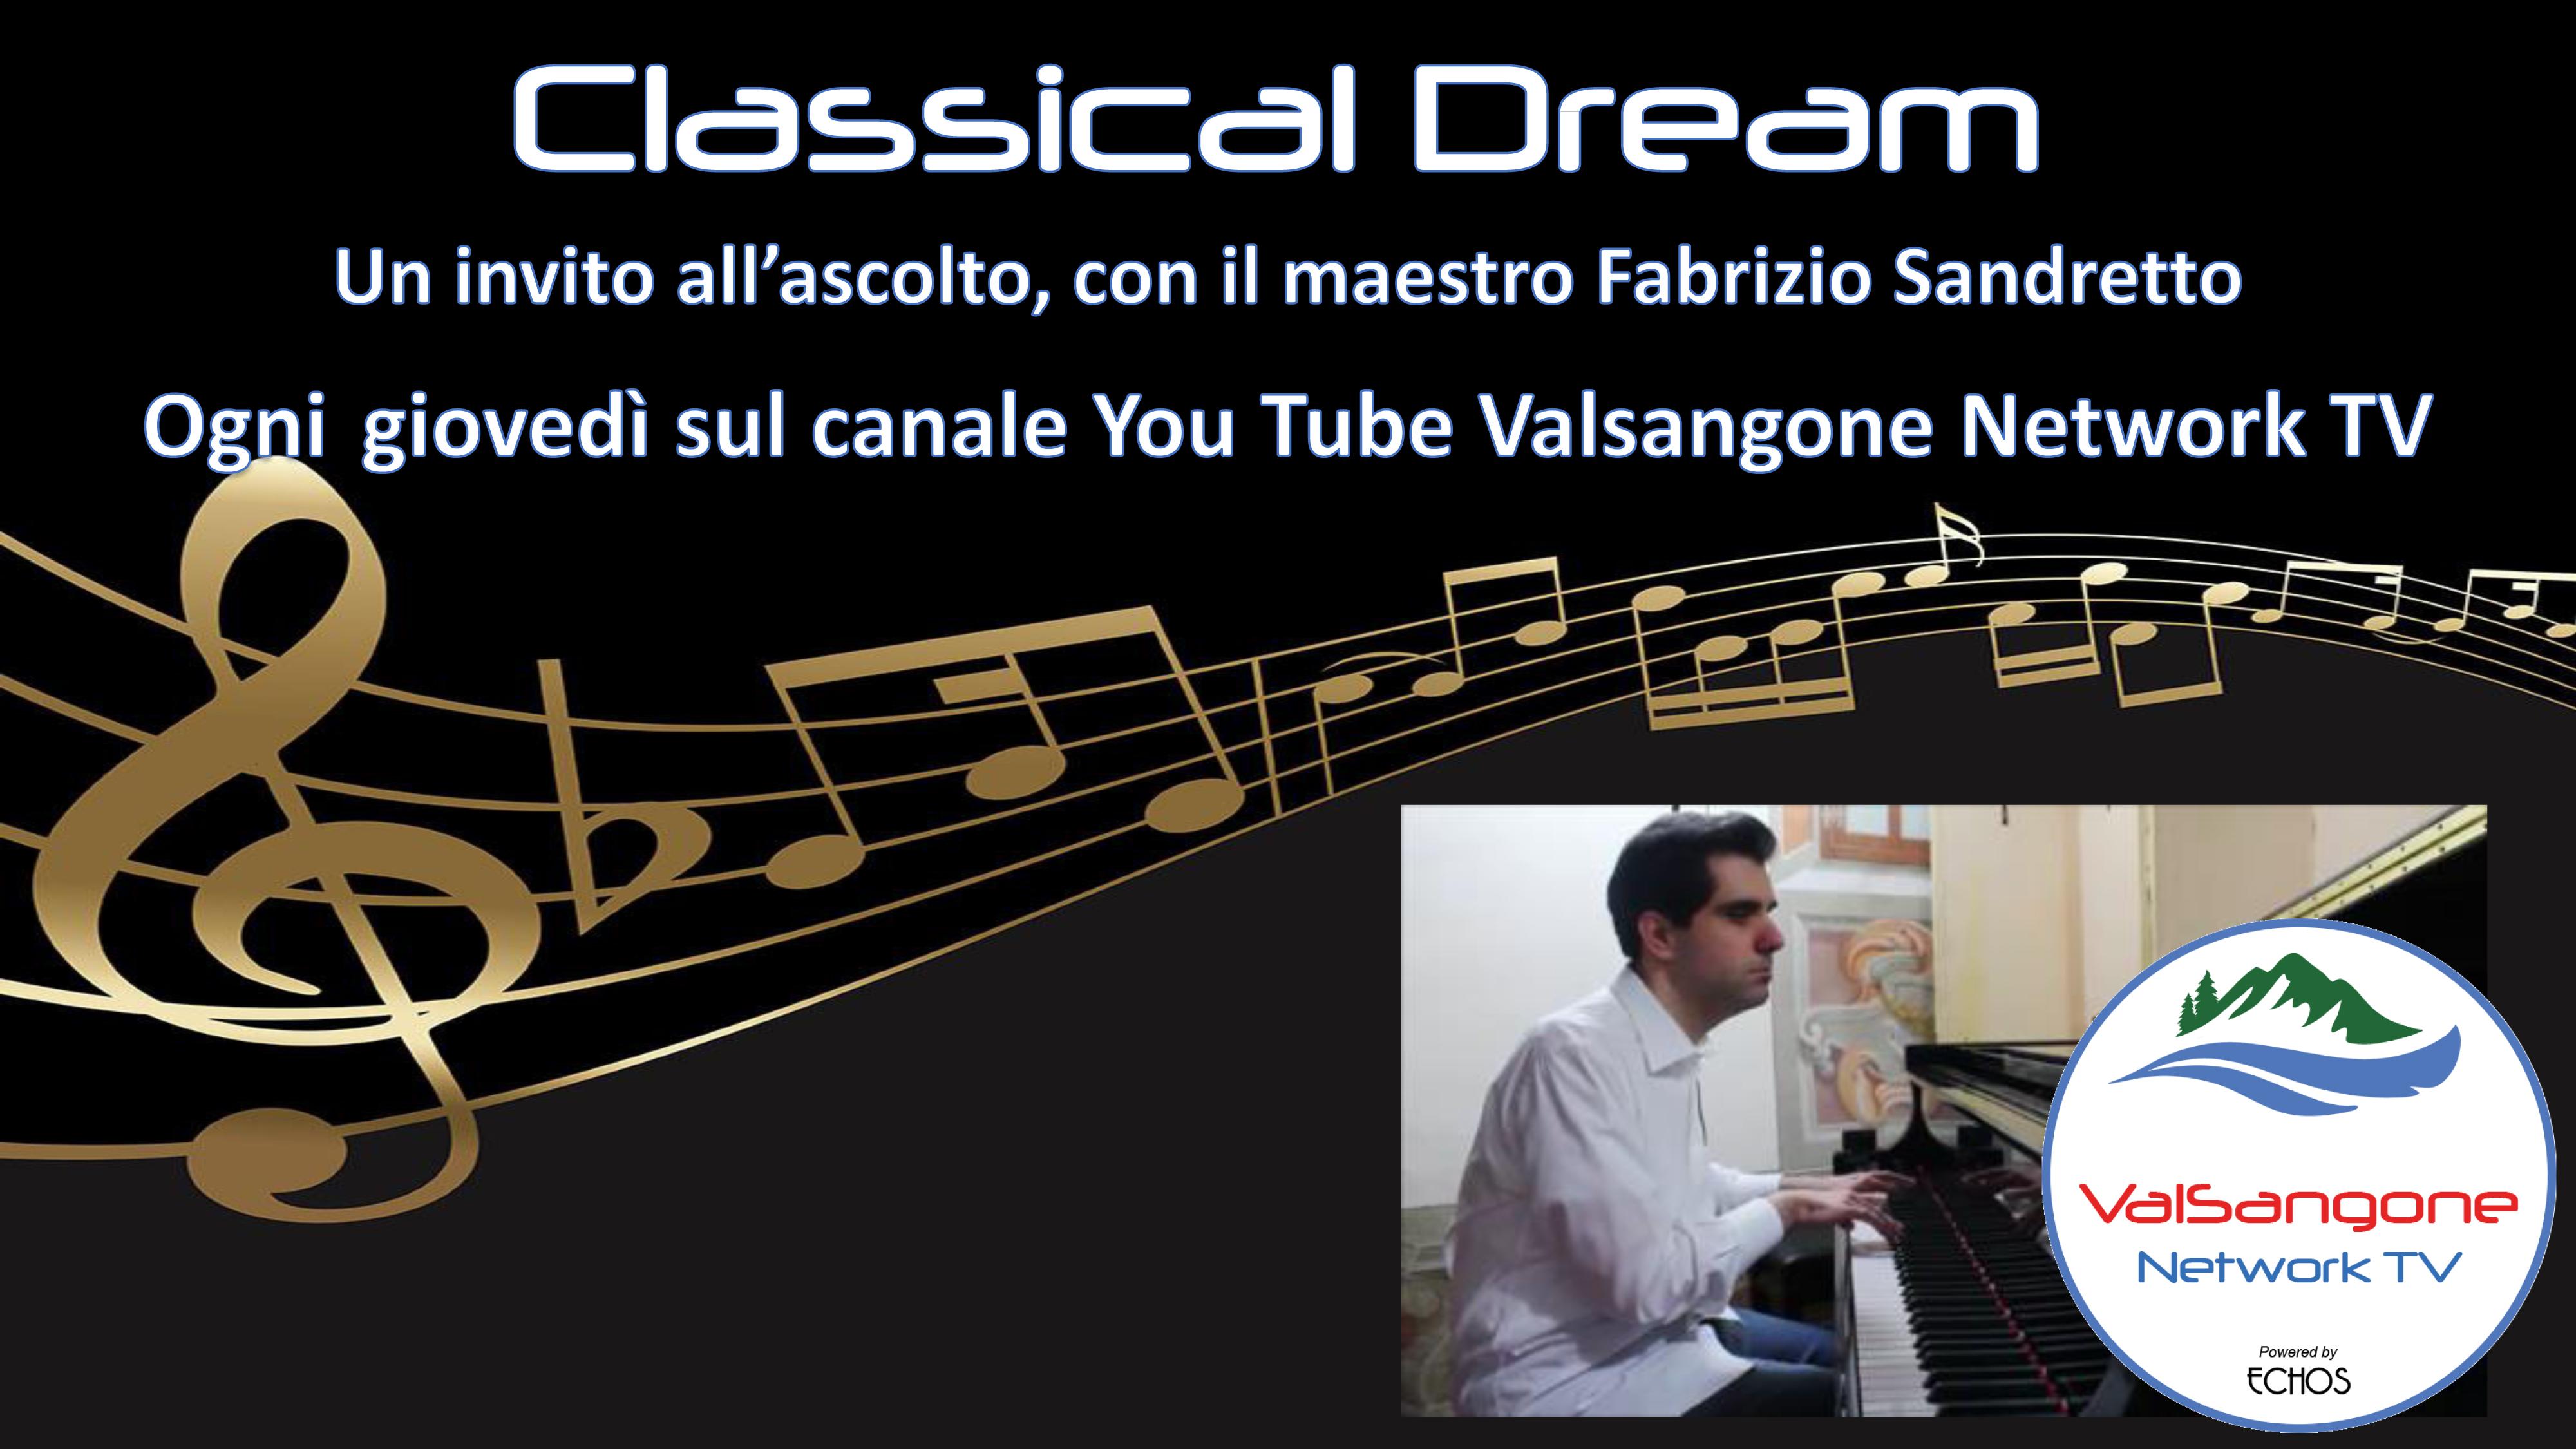 Classical Dream